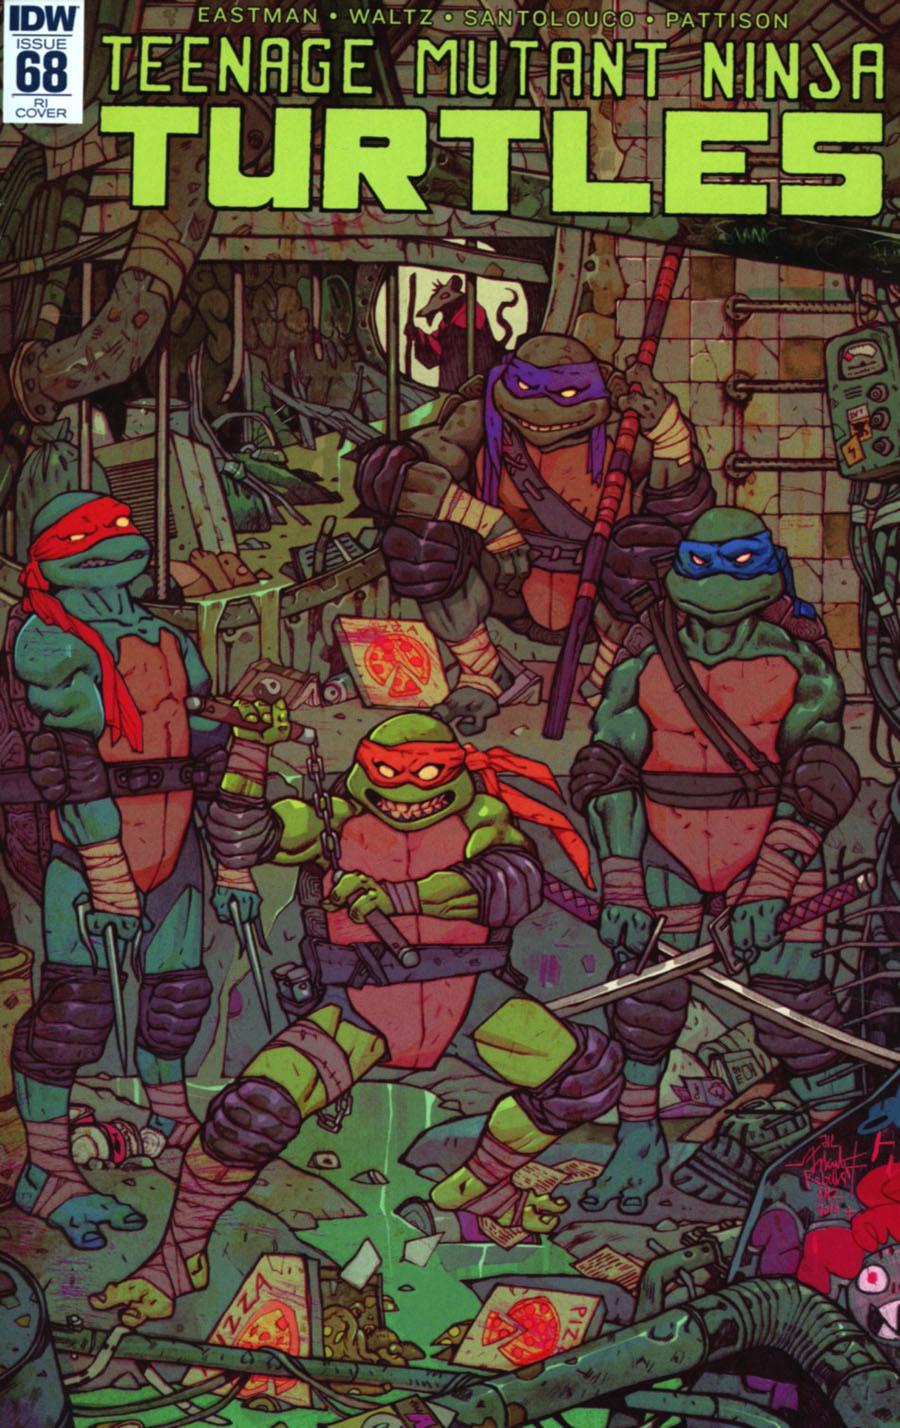 Teenage Mutant Ninja Turtles Vol 5 #68 Cover C Incentive Jakub Rebelka Variant Cover